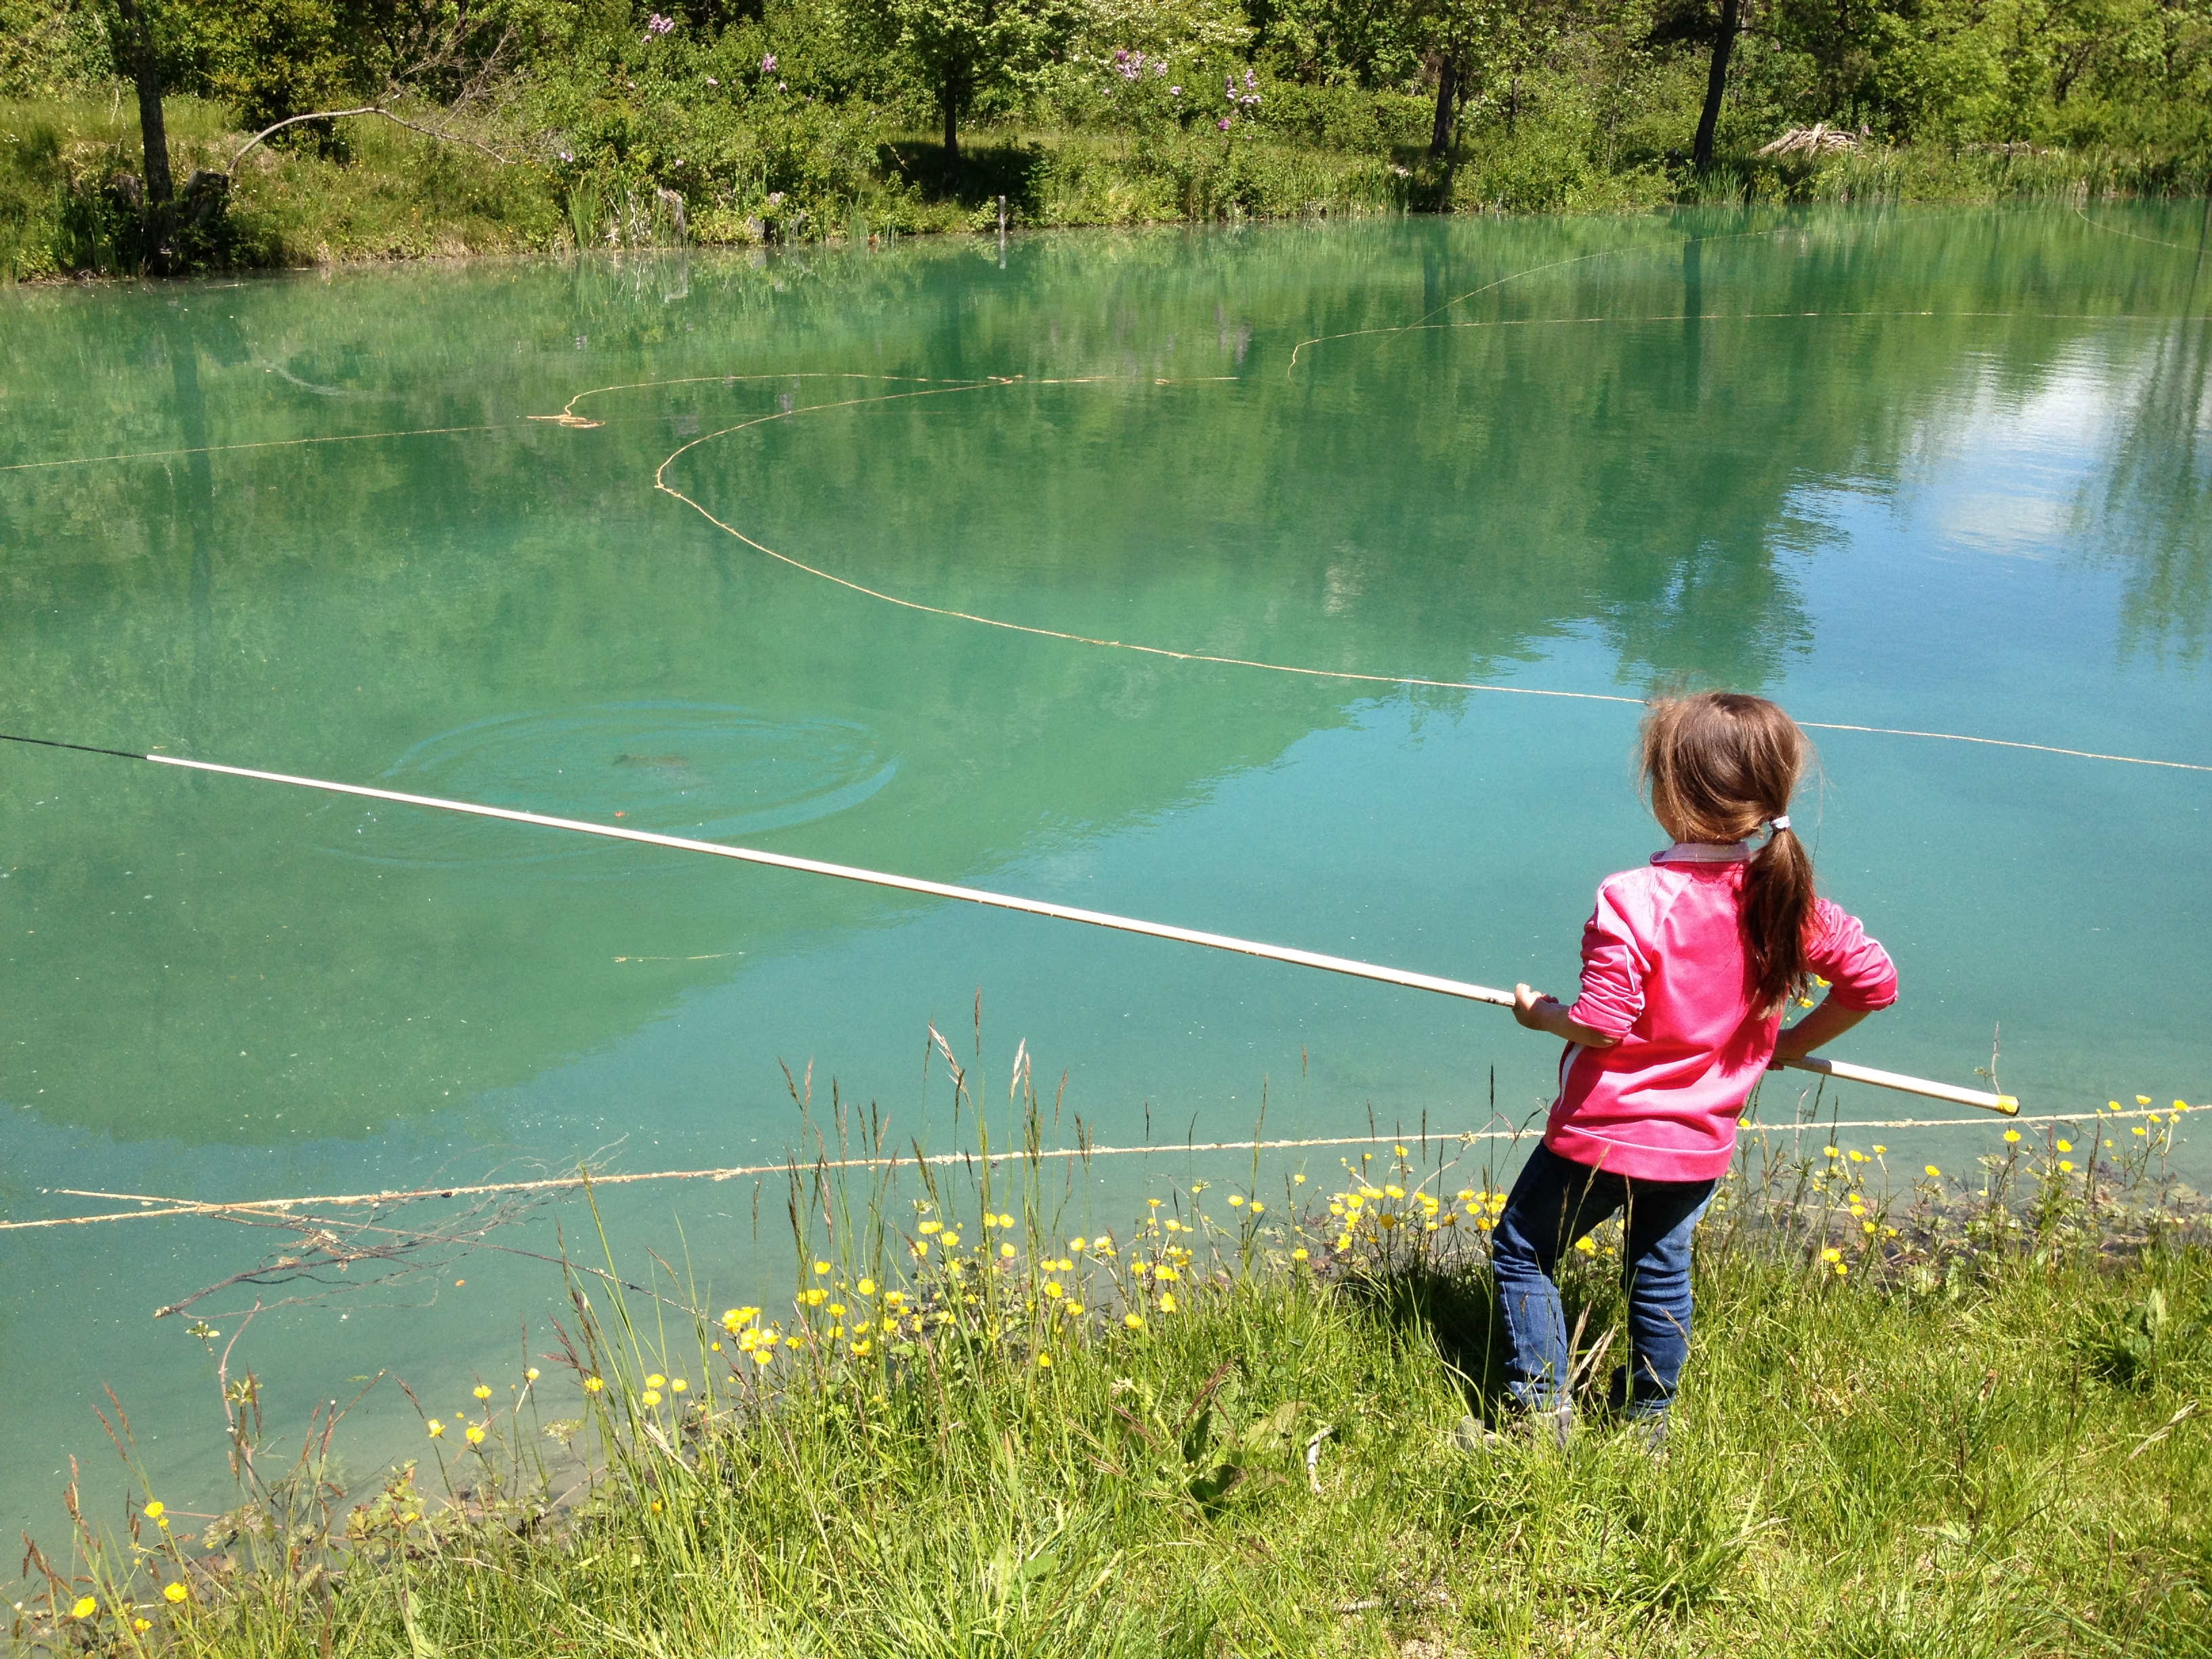 Pêche enfant